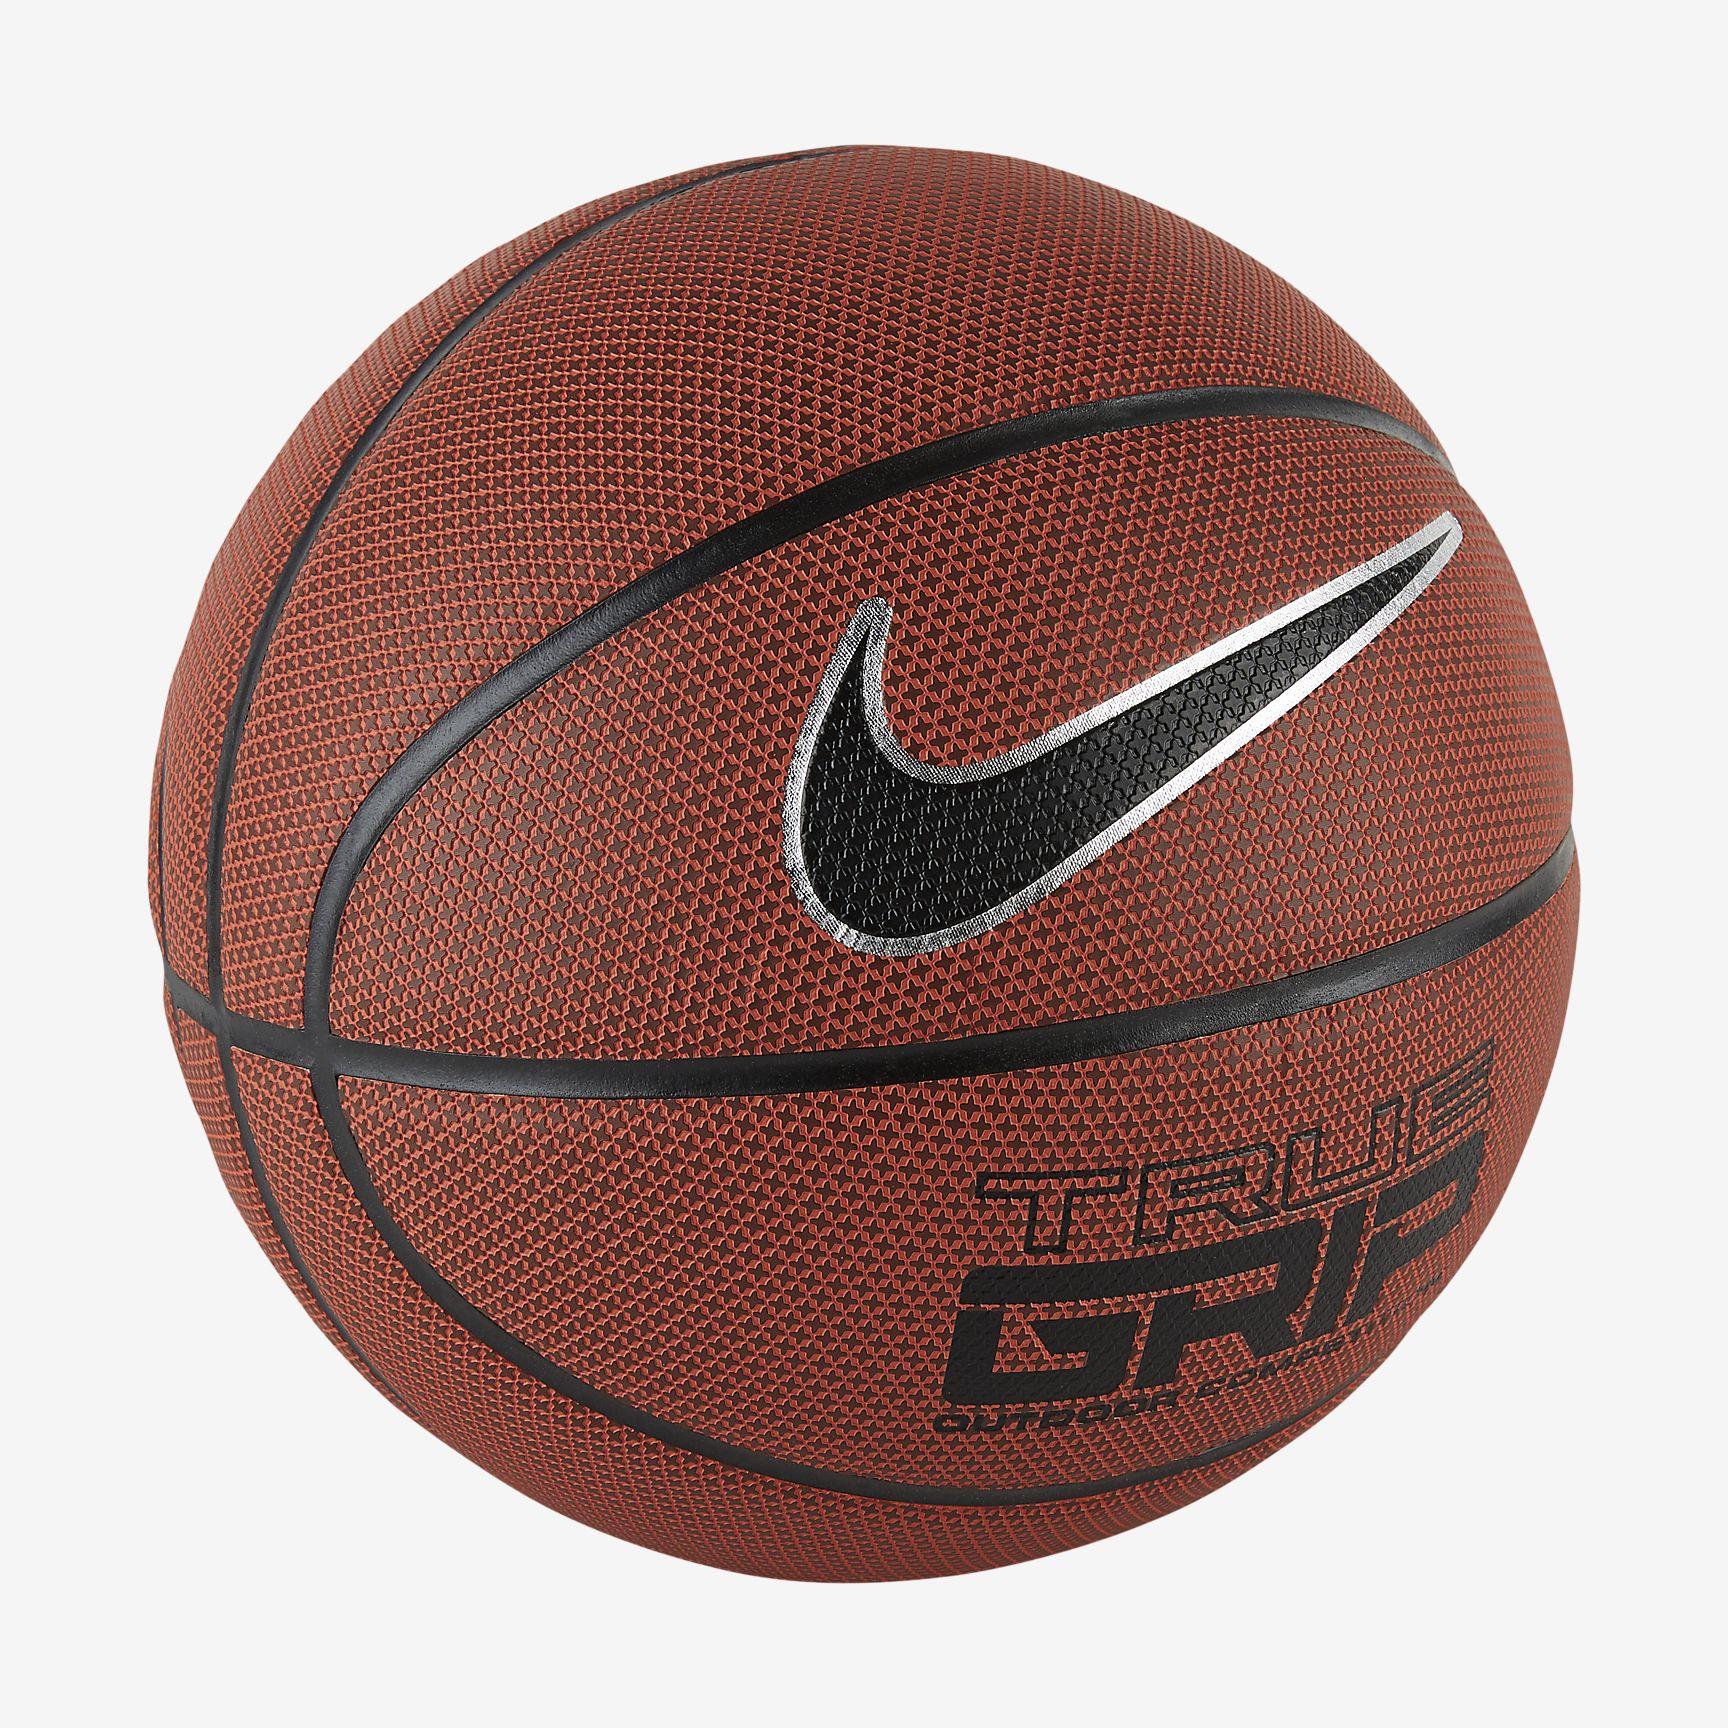 Nike 耐克 True Grip Outdoor 8P 篮球 7号